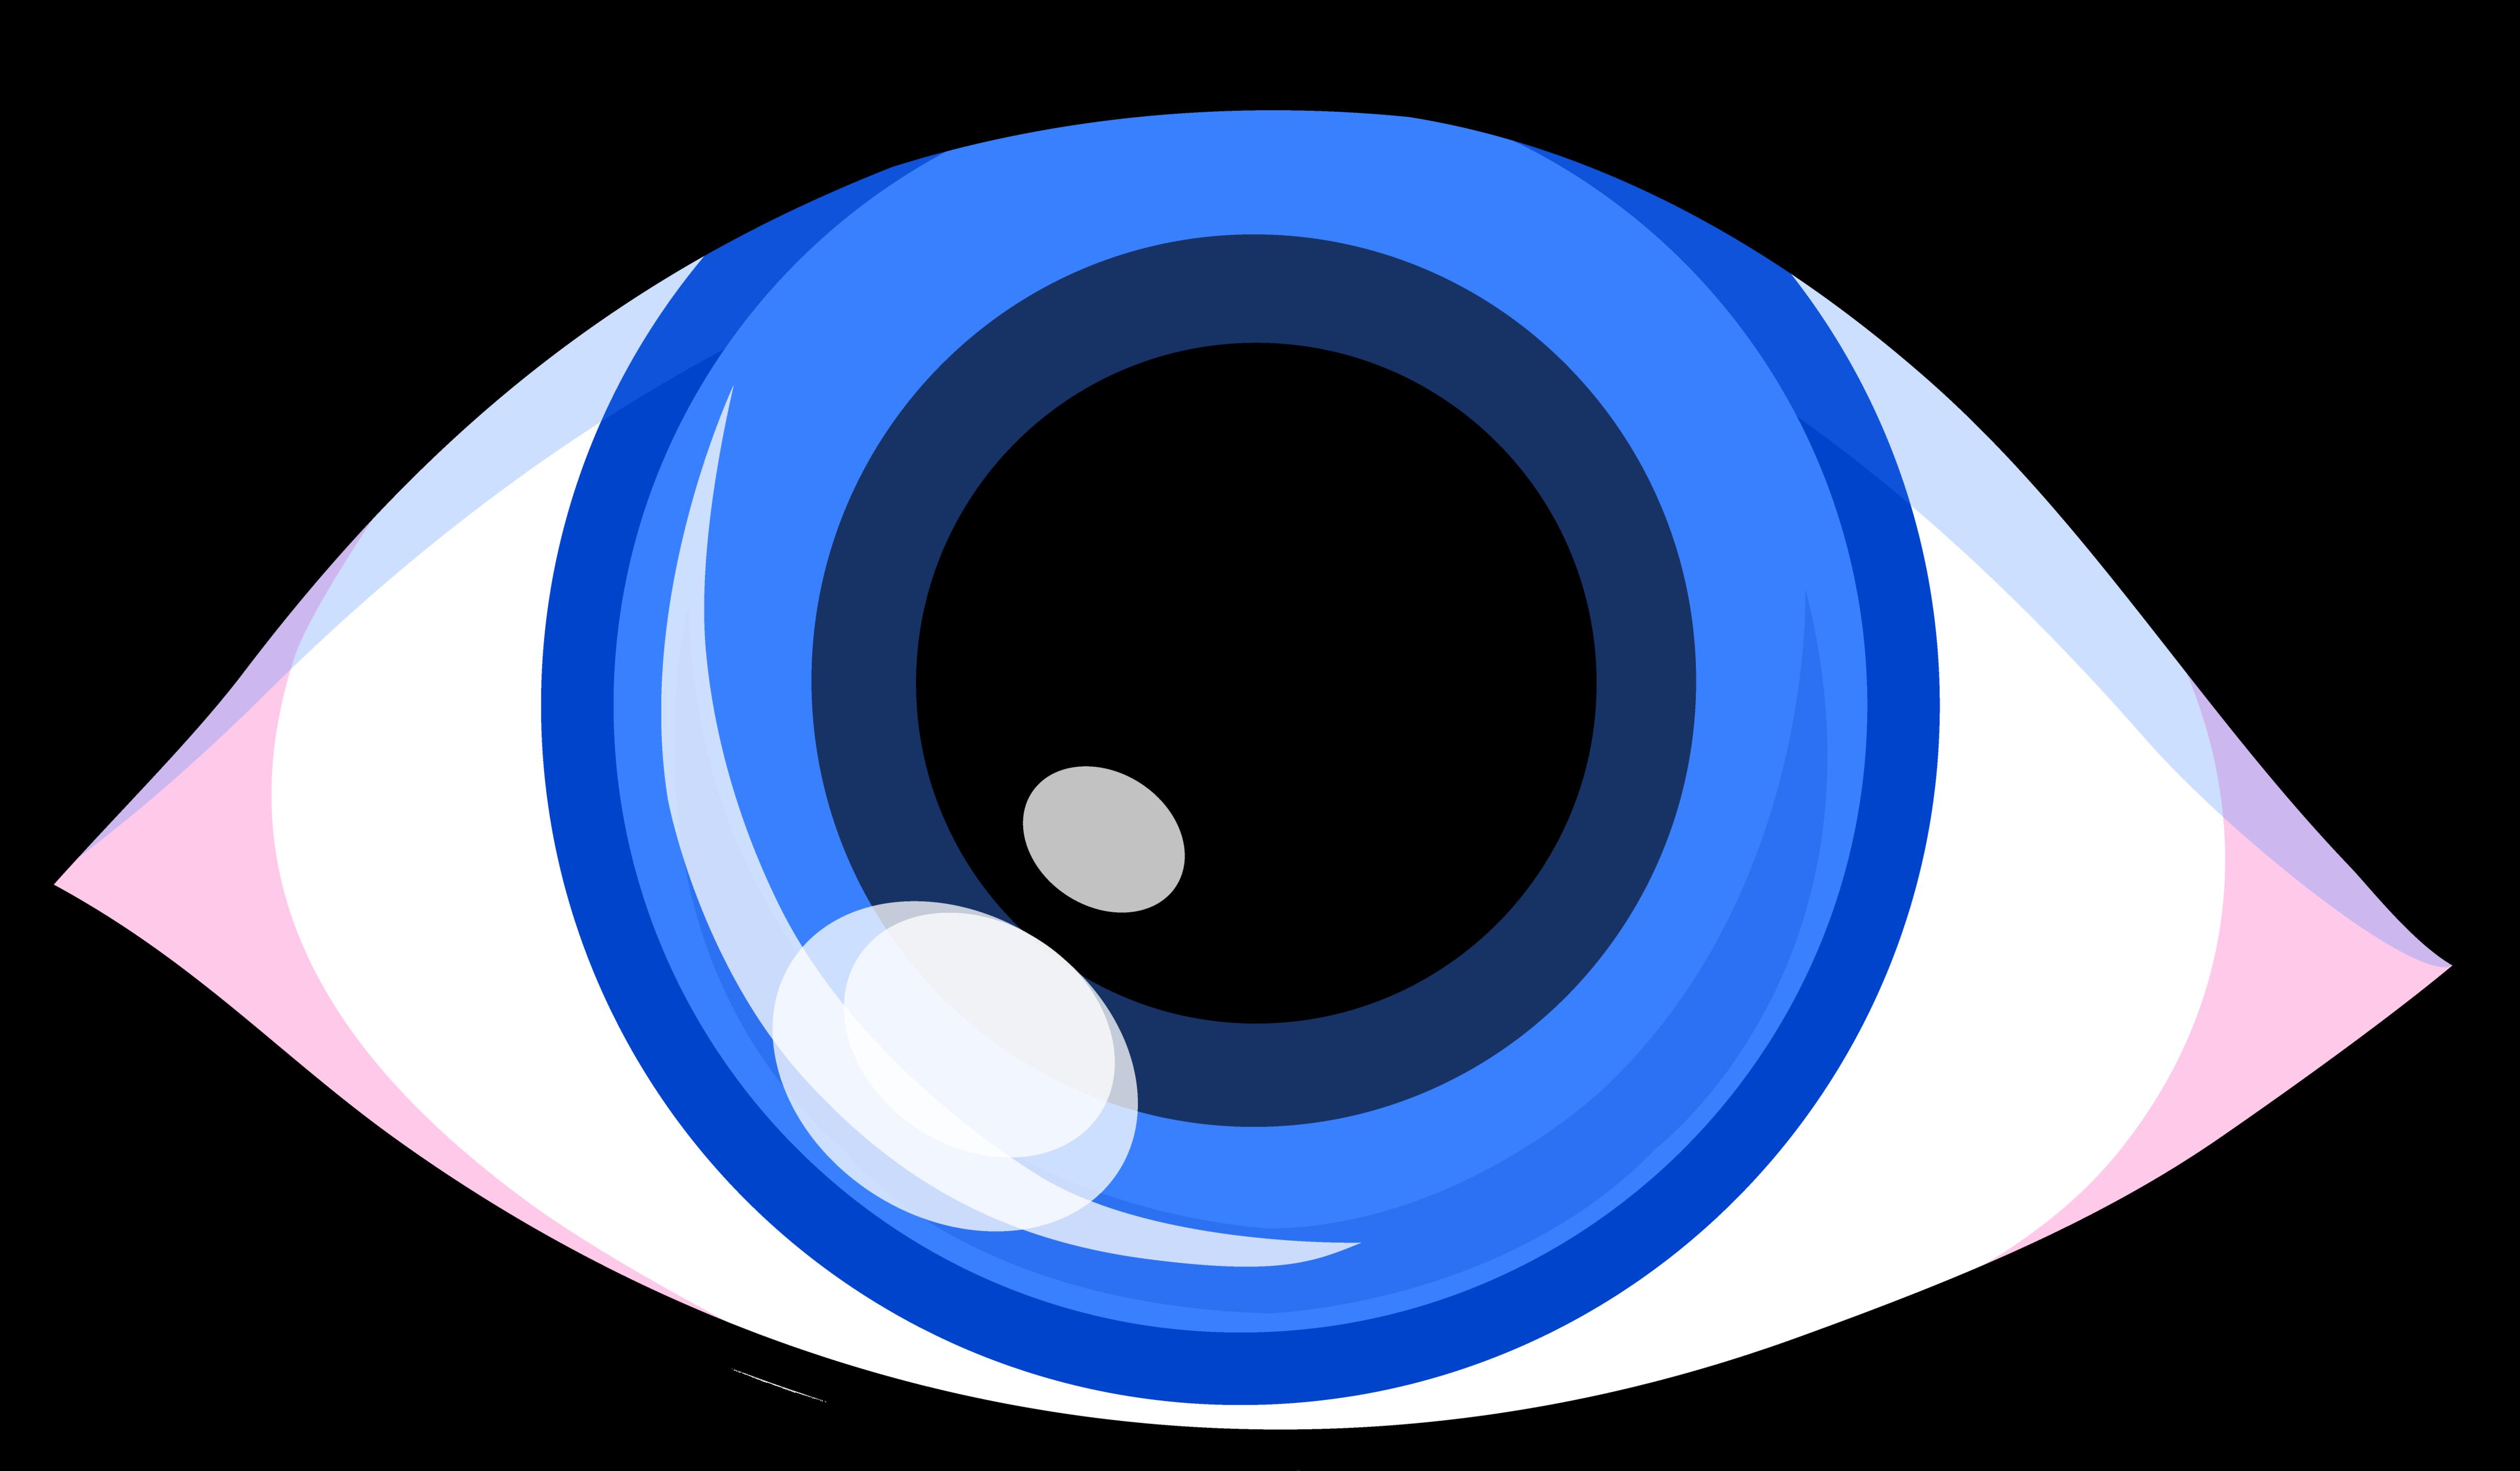 Blue Eyes clipart clipart transparent Clipart free eye Clipart Clip